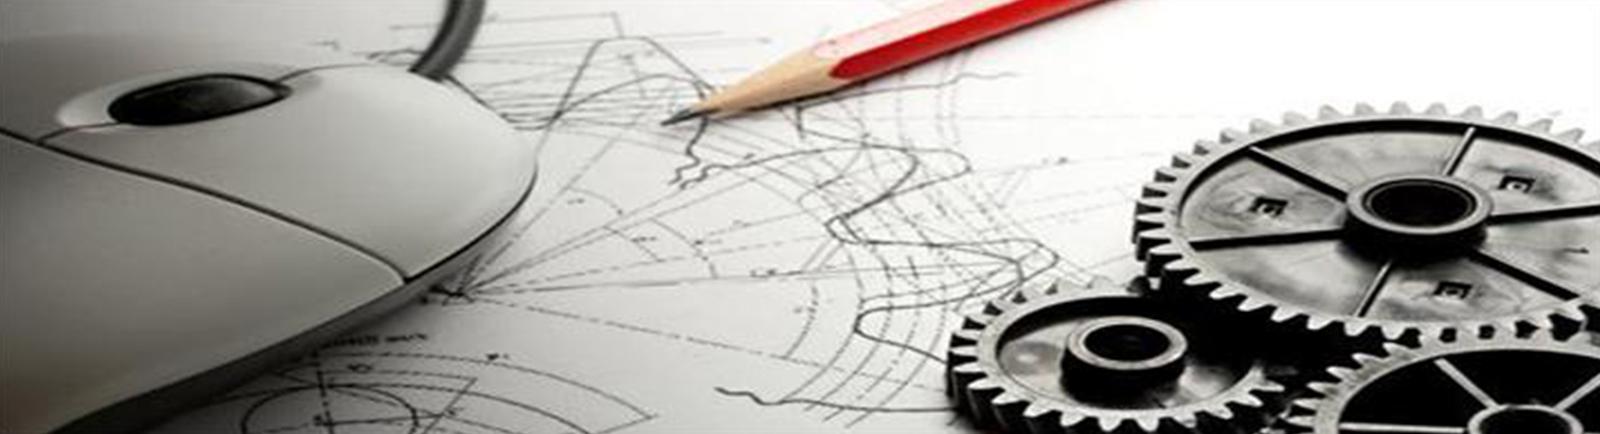 Markalize - Endüstriyel Tasarım Tescili